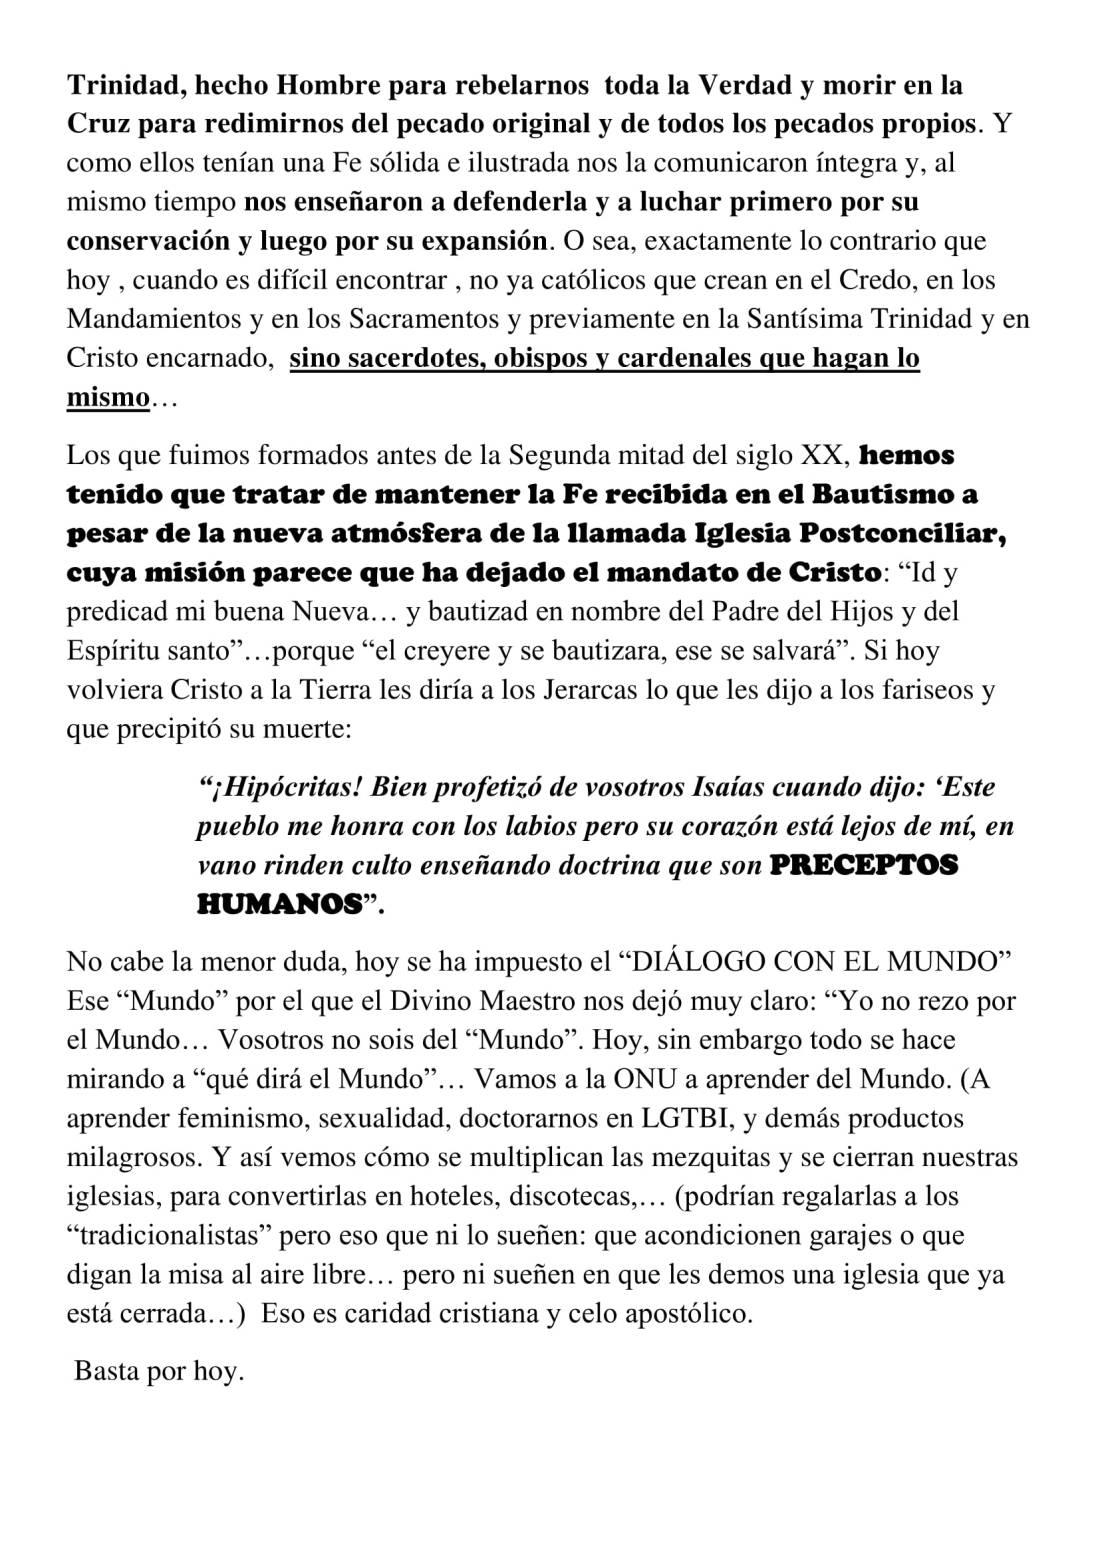 DE ESCÁNDALO EN ESCÁNDALO-6